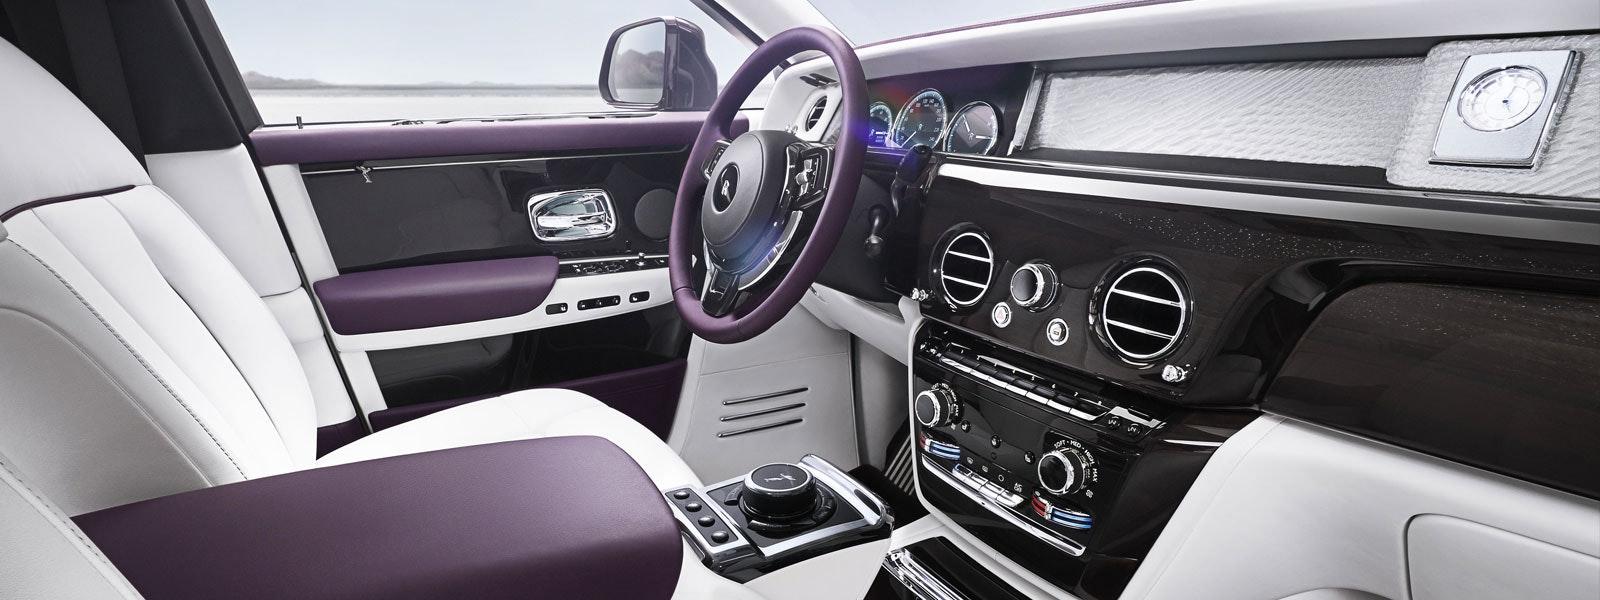 Rolls Royce Suv Interior Www Indiepedia Org